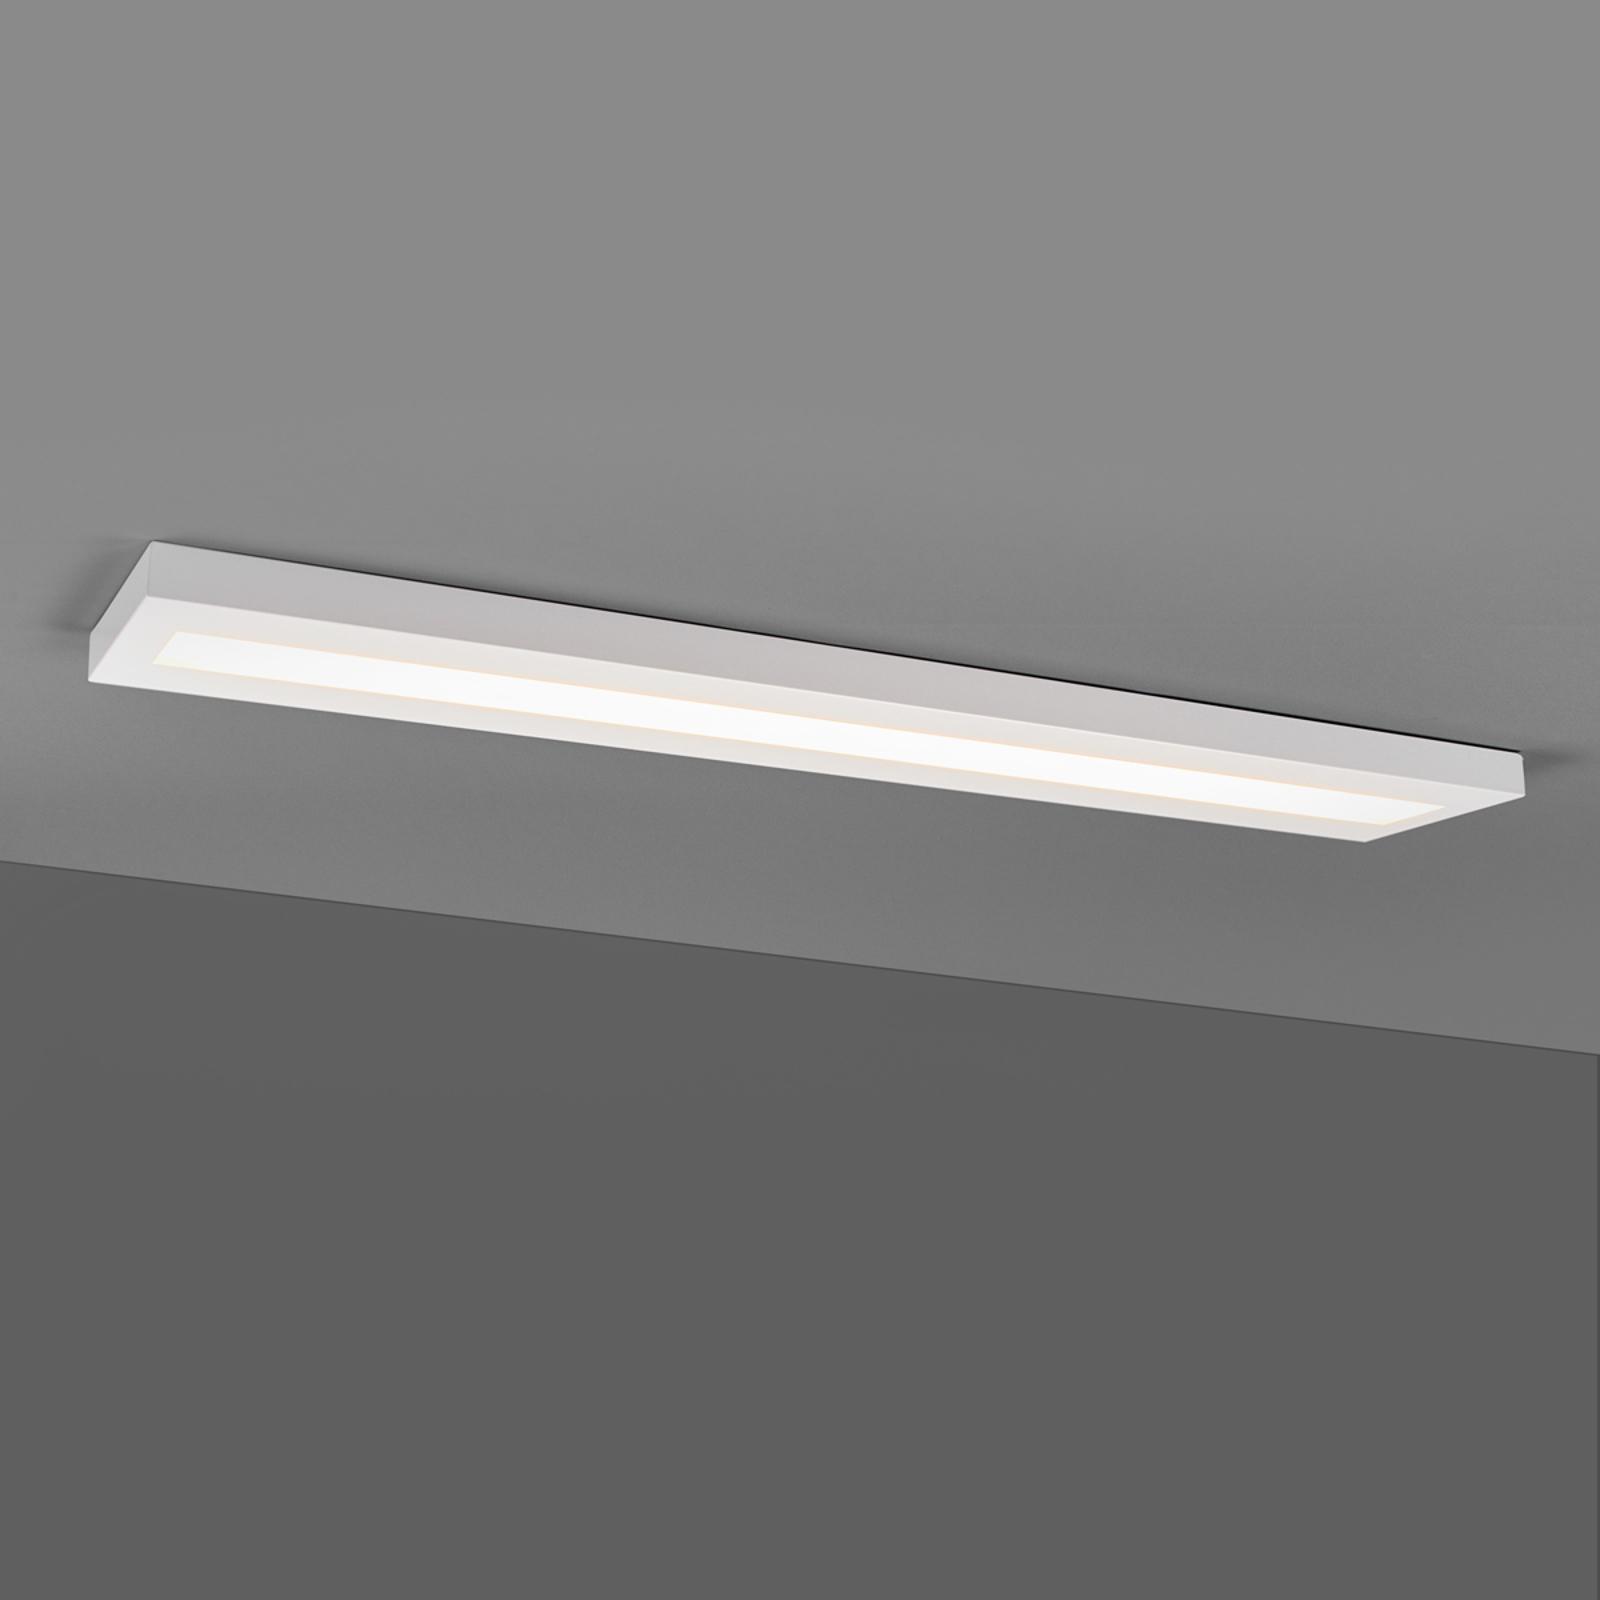 Plafonnier LED oblong 33W, blanc BAP